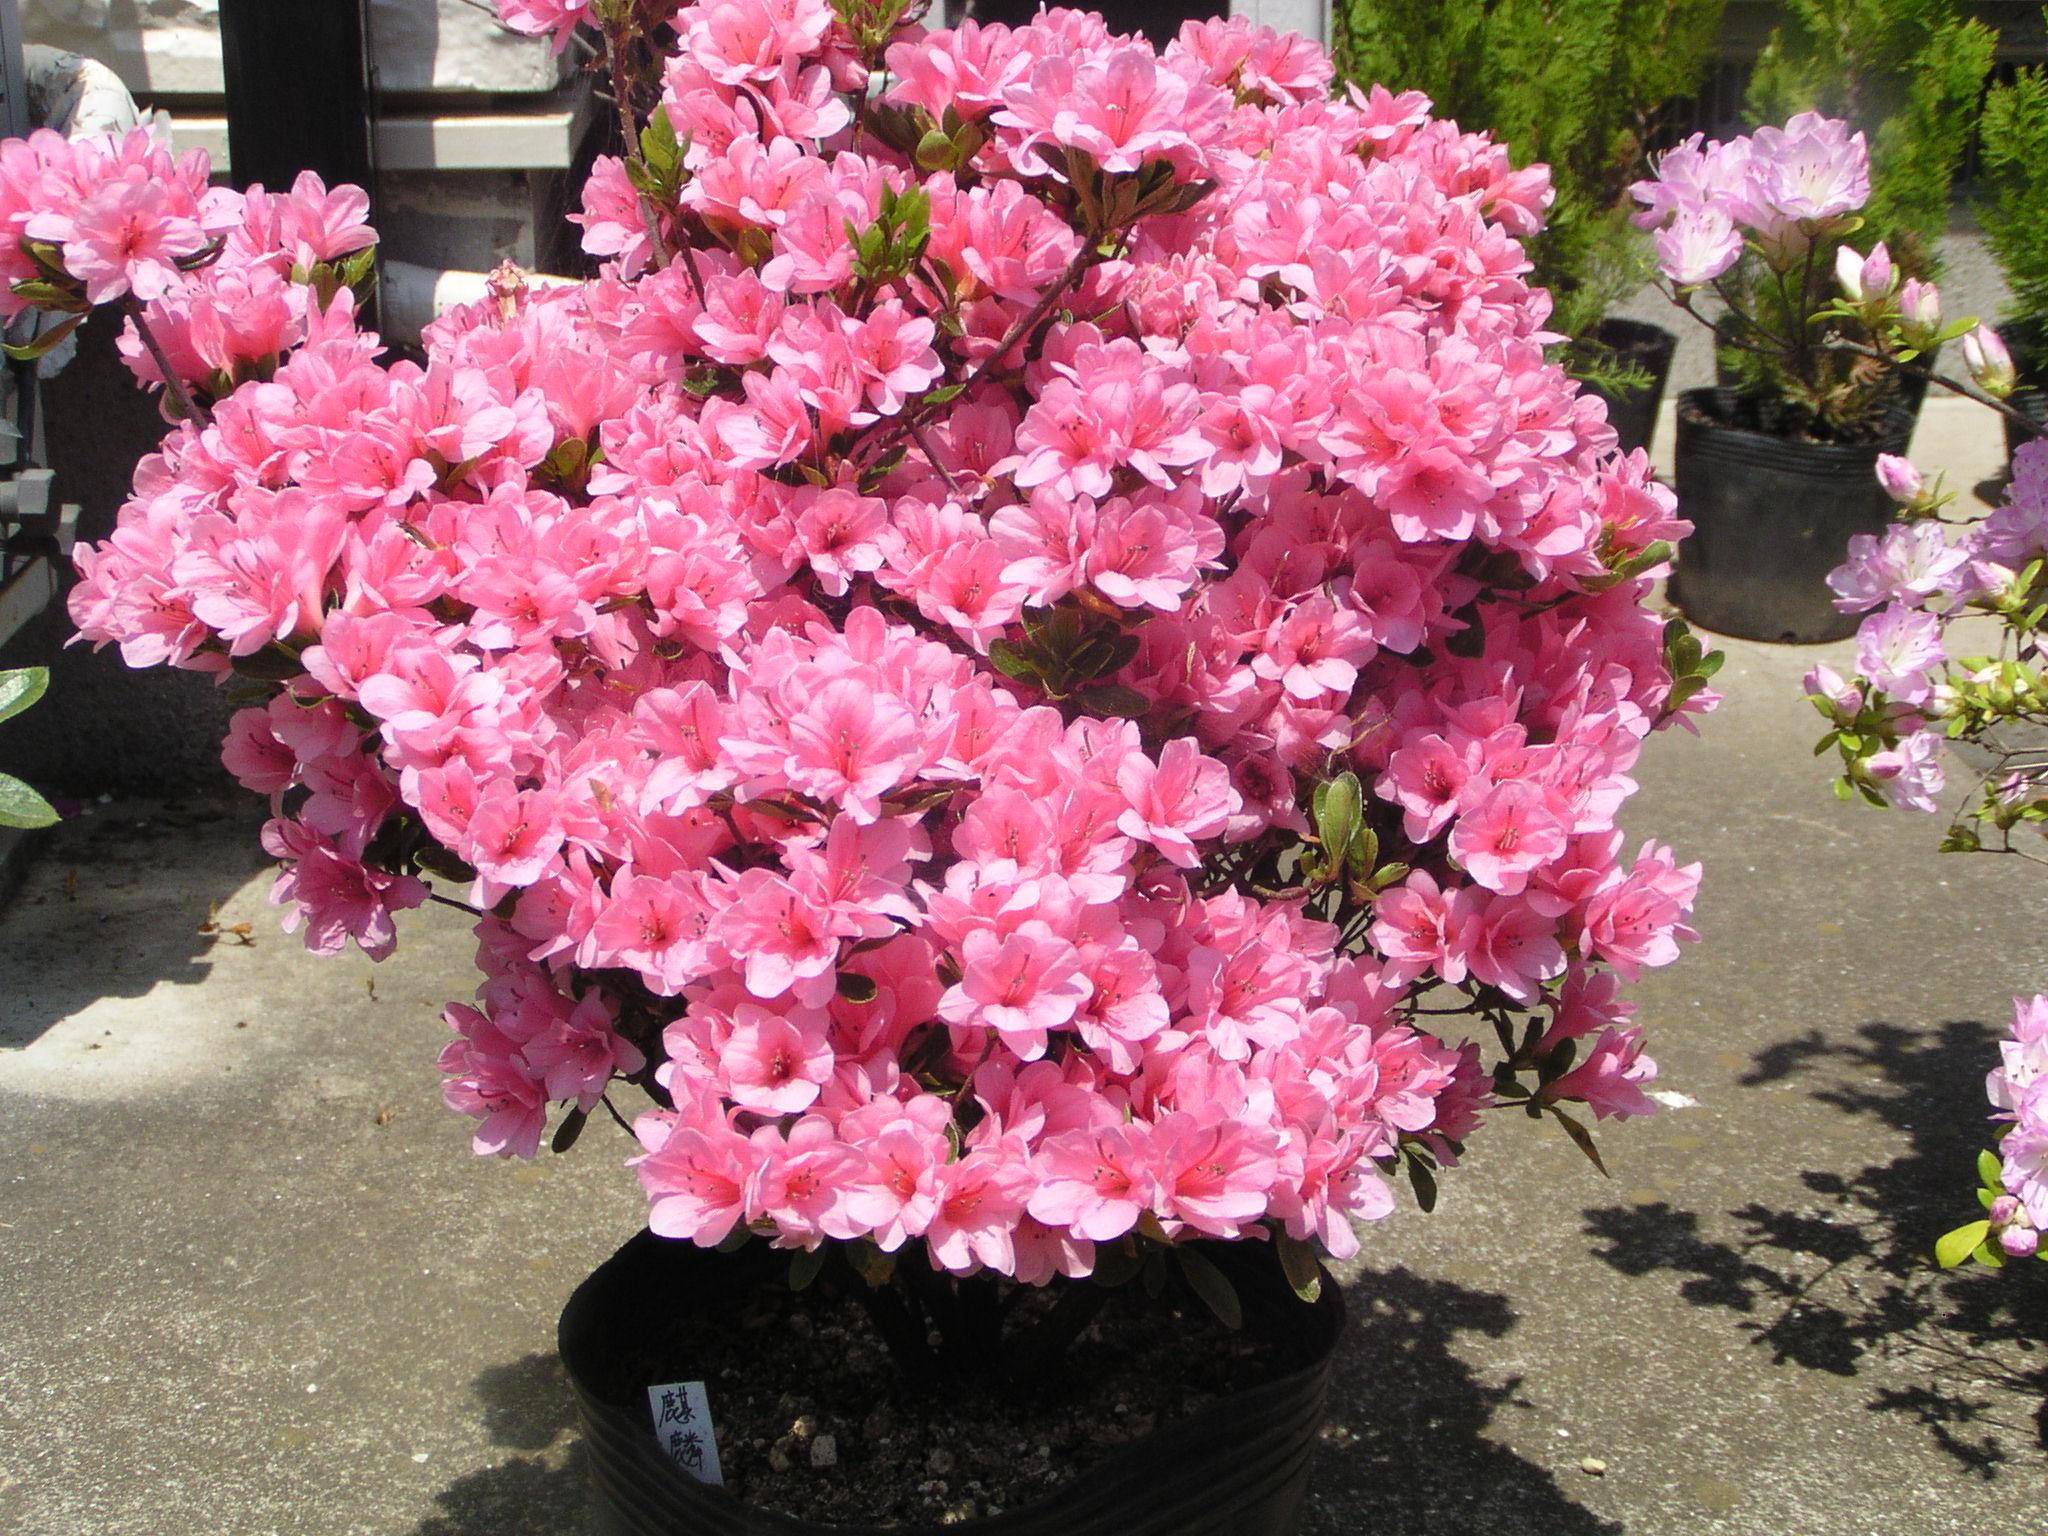 Rhododendron Collection:ツツジ・サツキ・アザレア・シャクナゲ 開花写真集